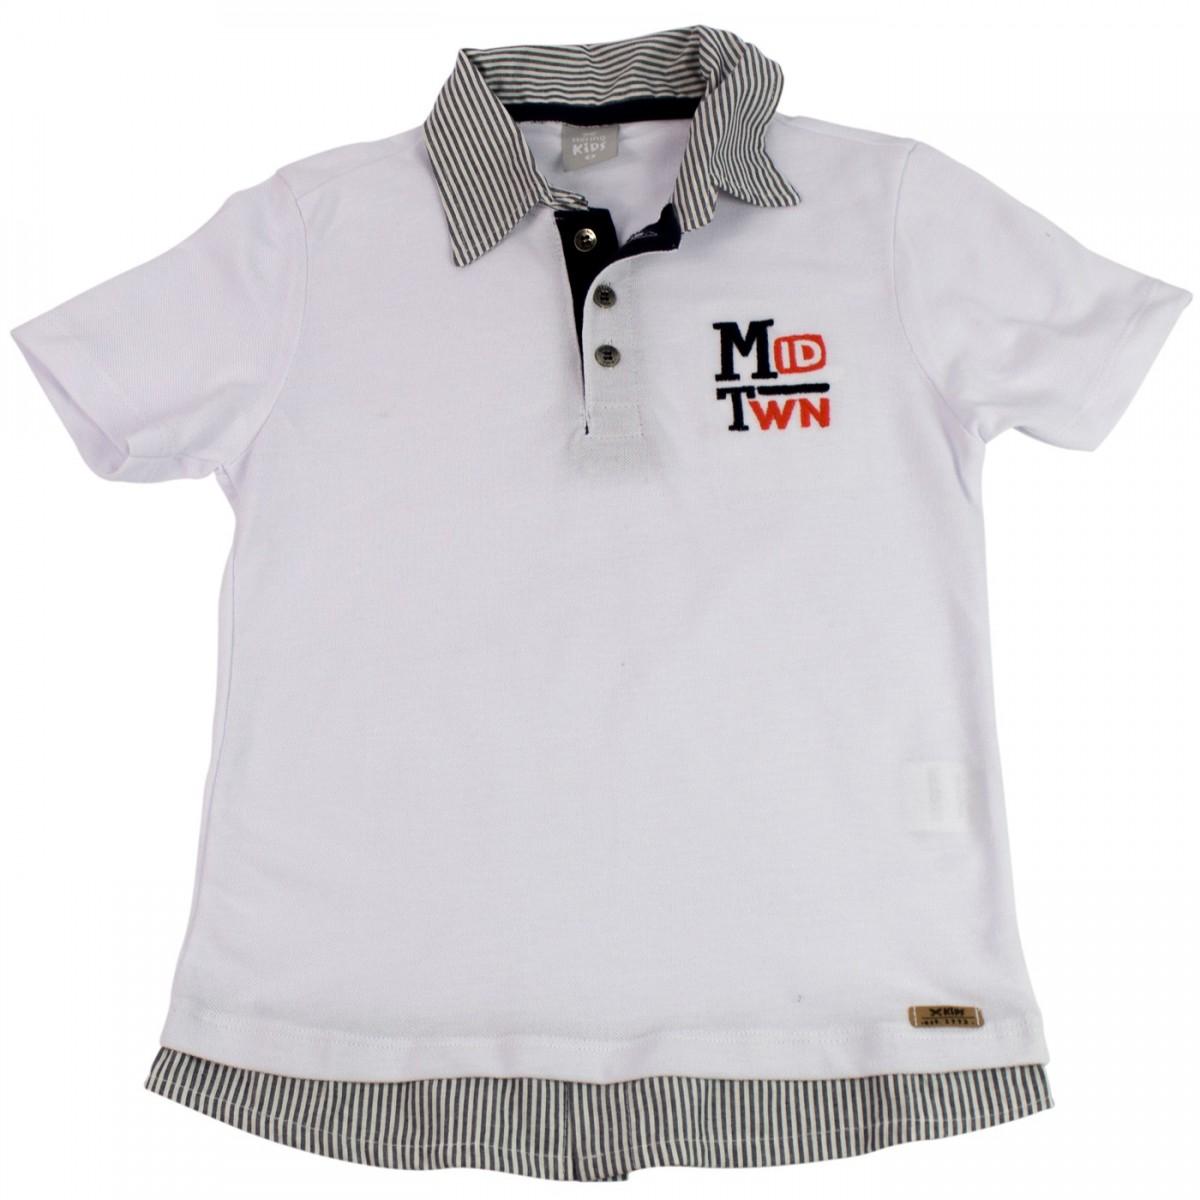 465762d4d6 Bizz Store - Camisa Polo Infantil Masculina Hering Kids Marinho